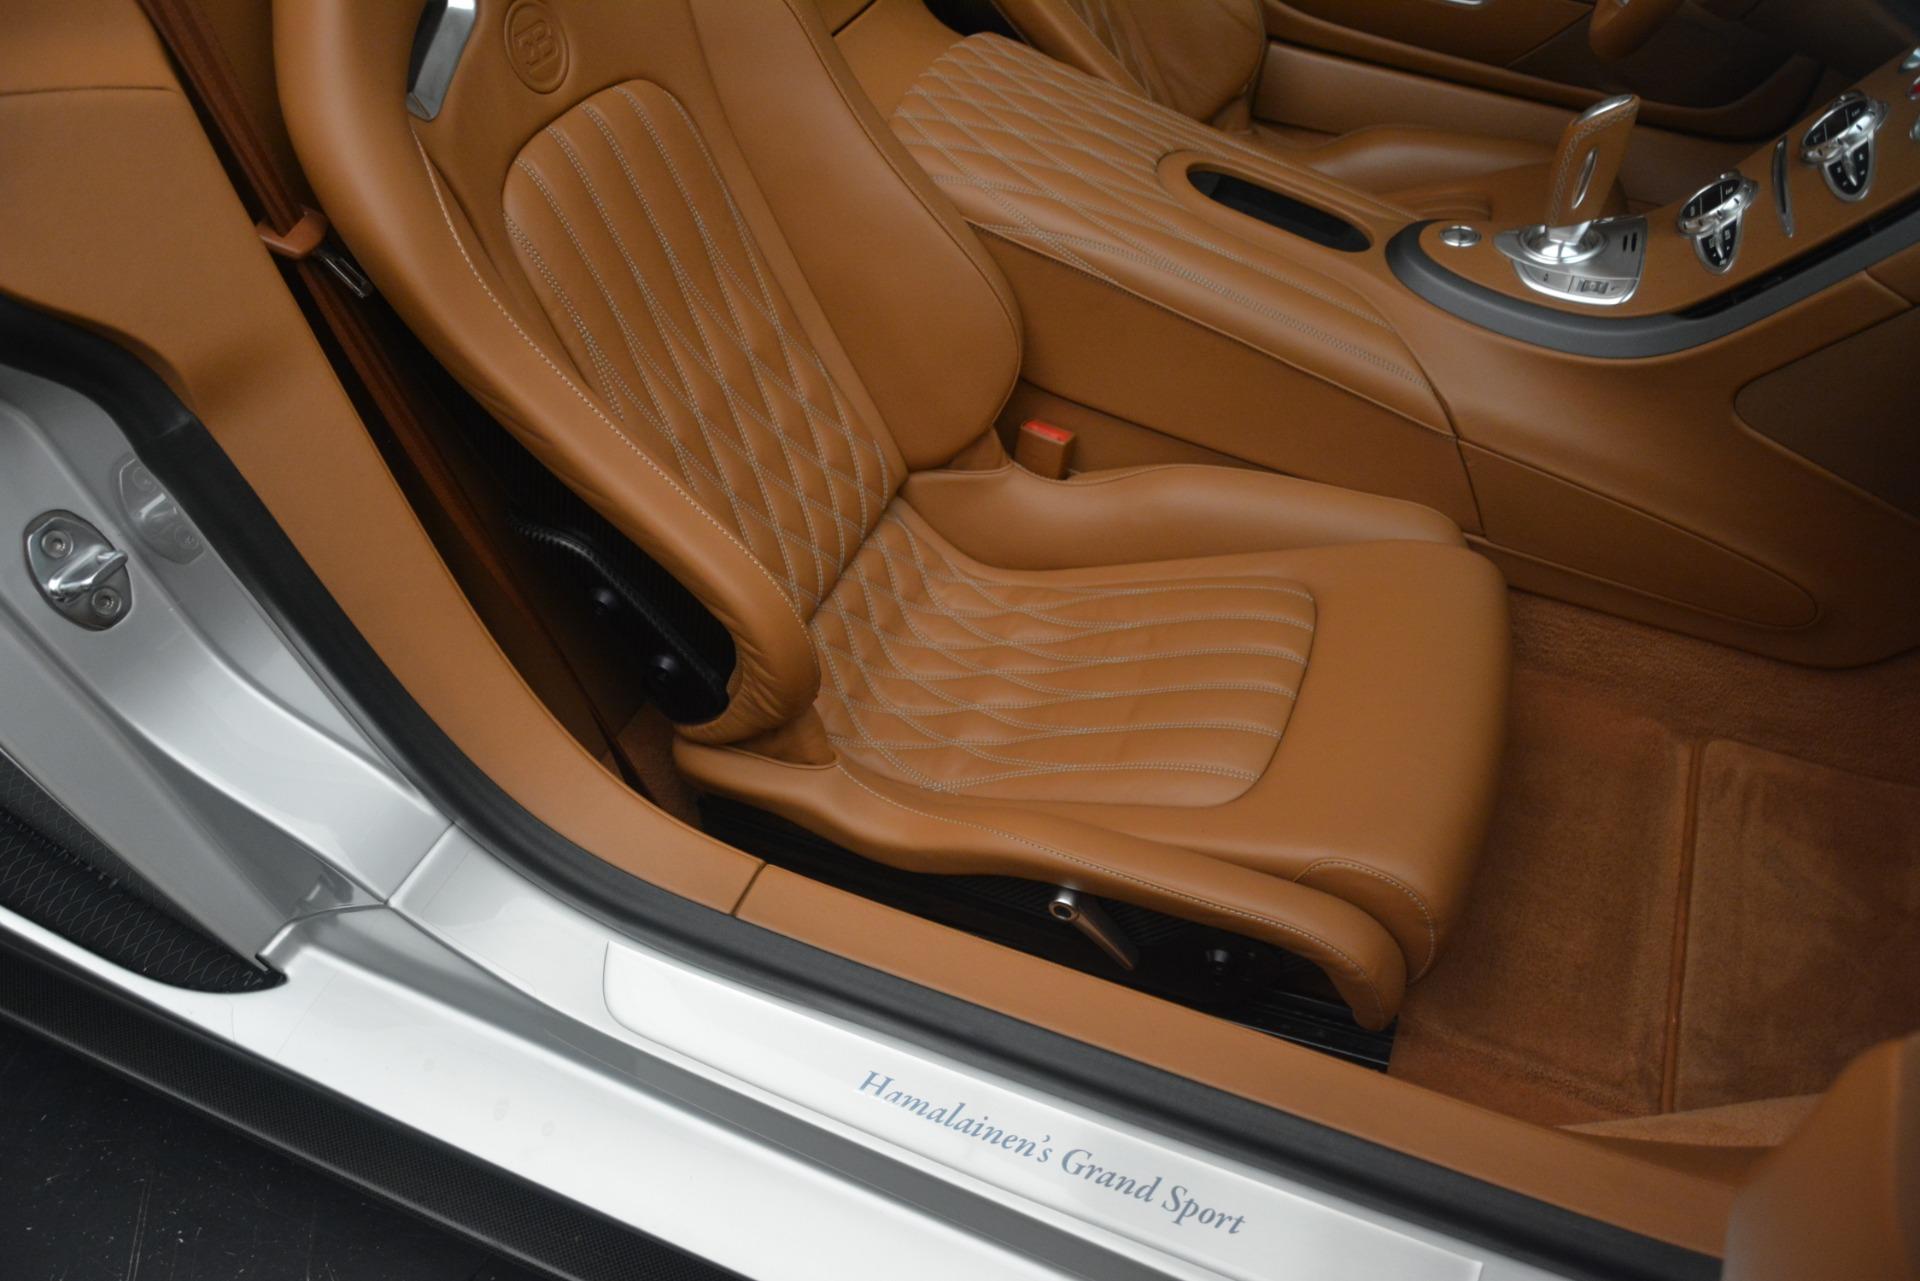 Used 2010 Bugatti Veyron 16.4 Grand Sport For Sale In Greenwich, CT 3159_p36